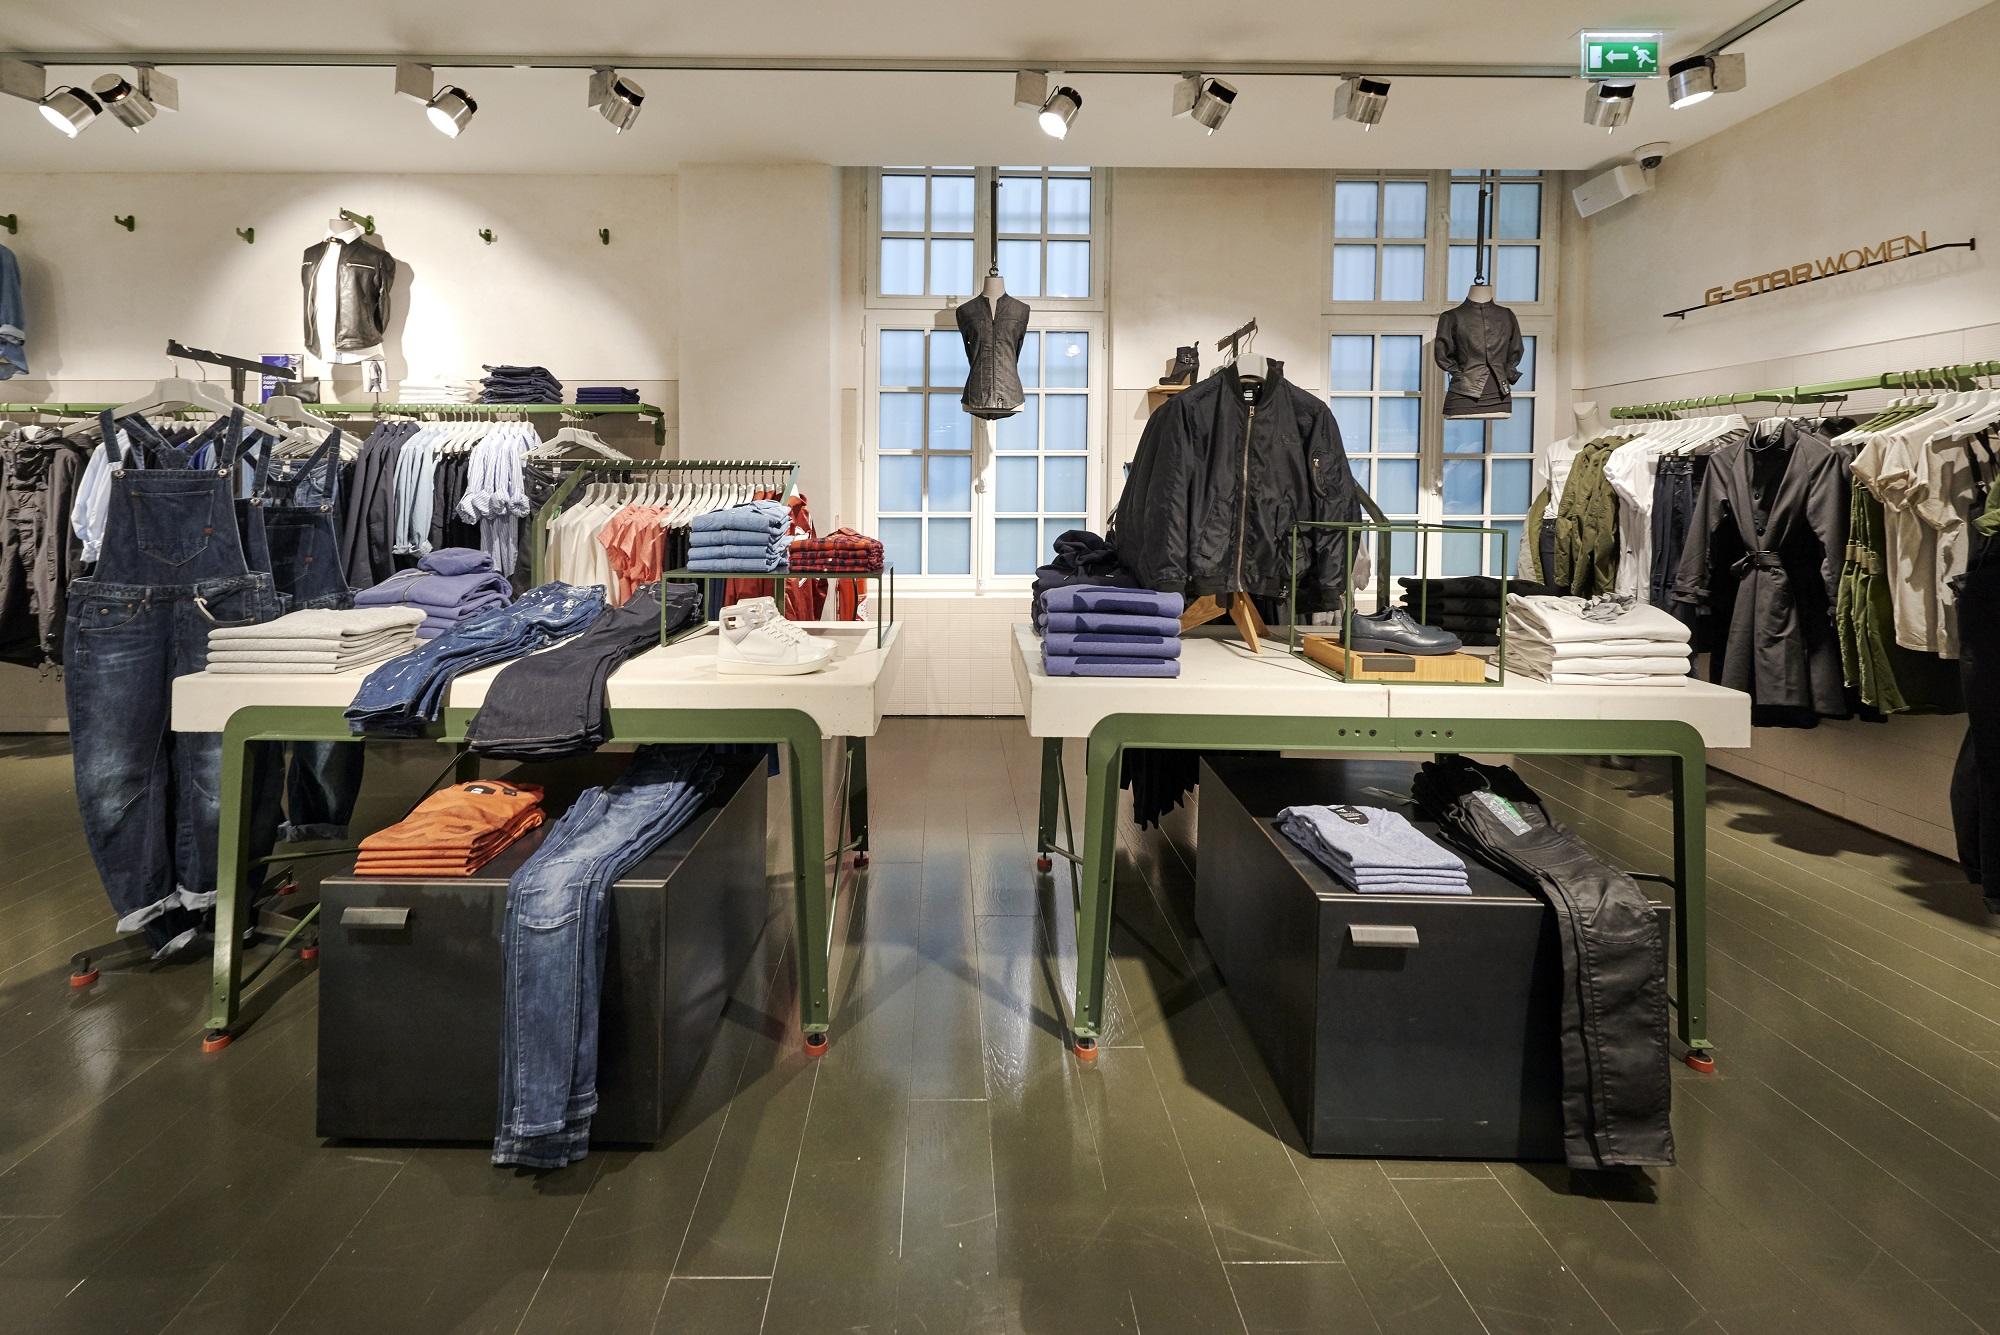 boutique g star jean